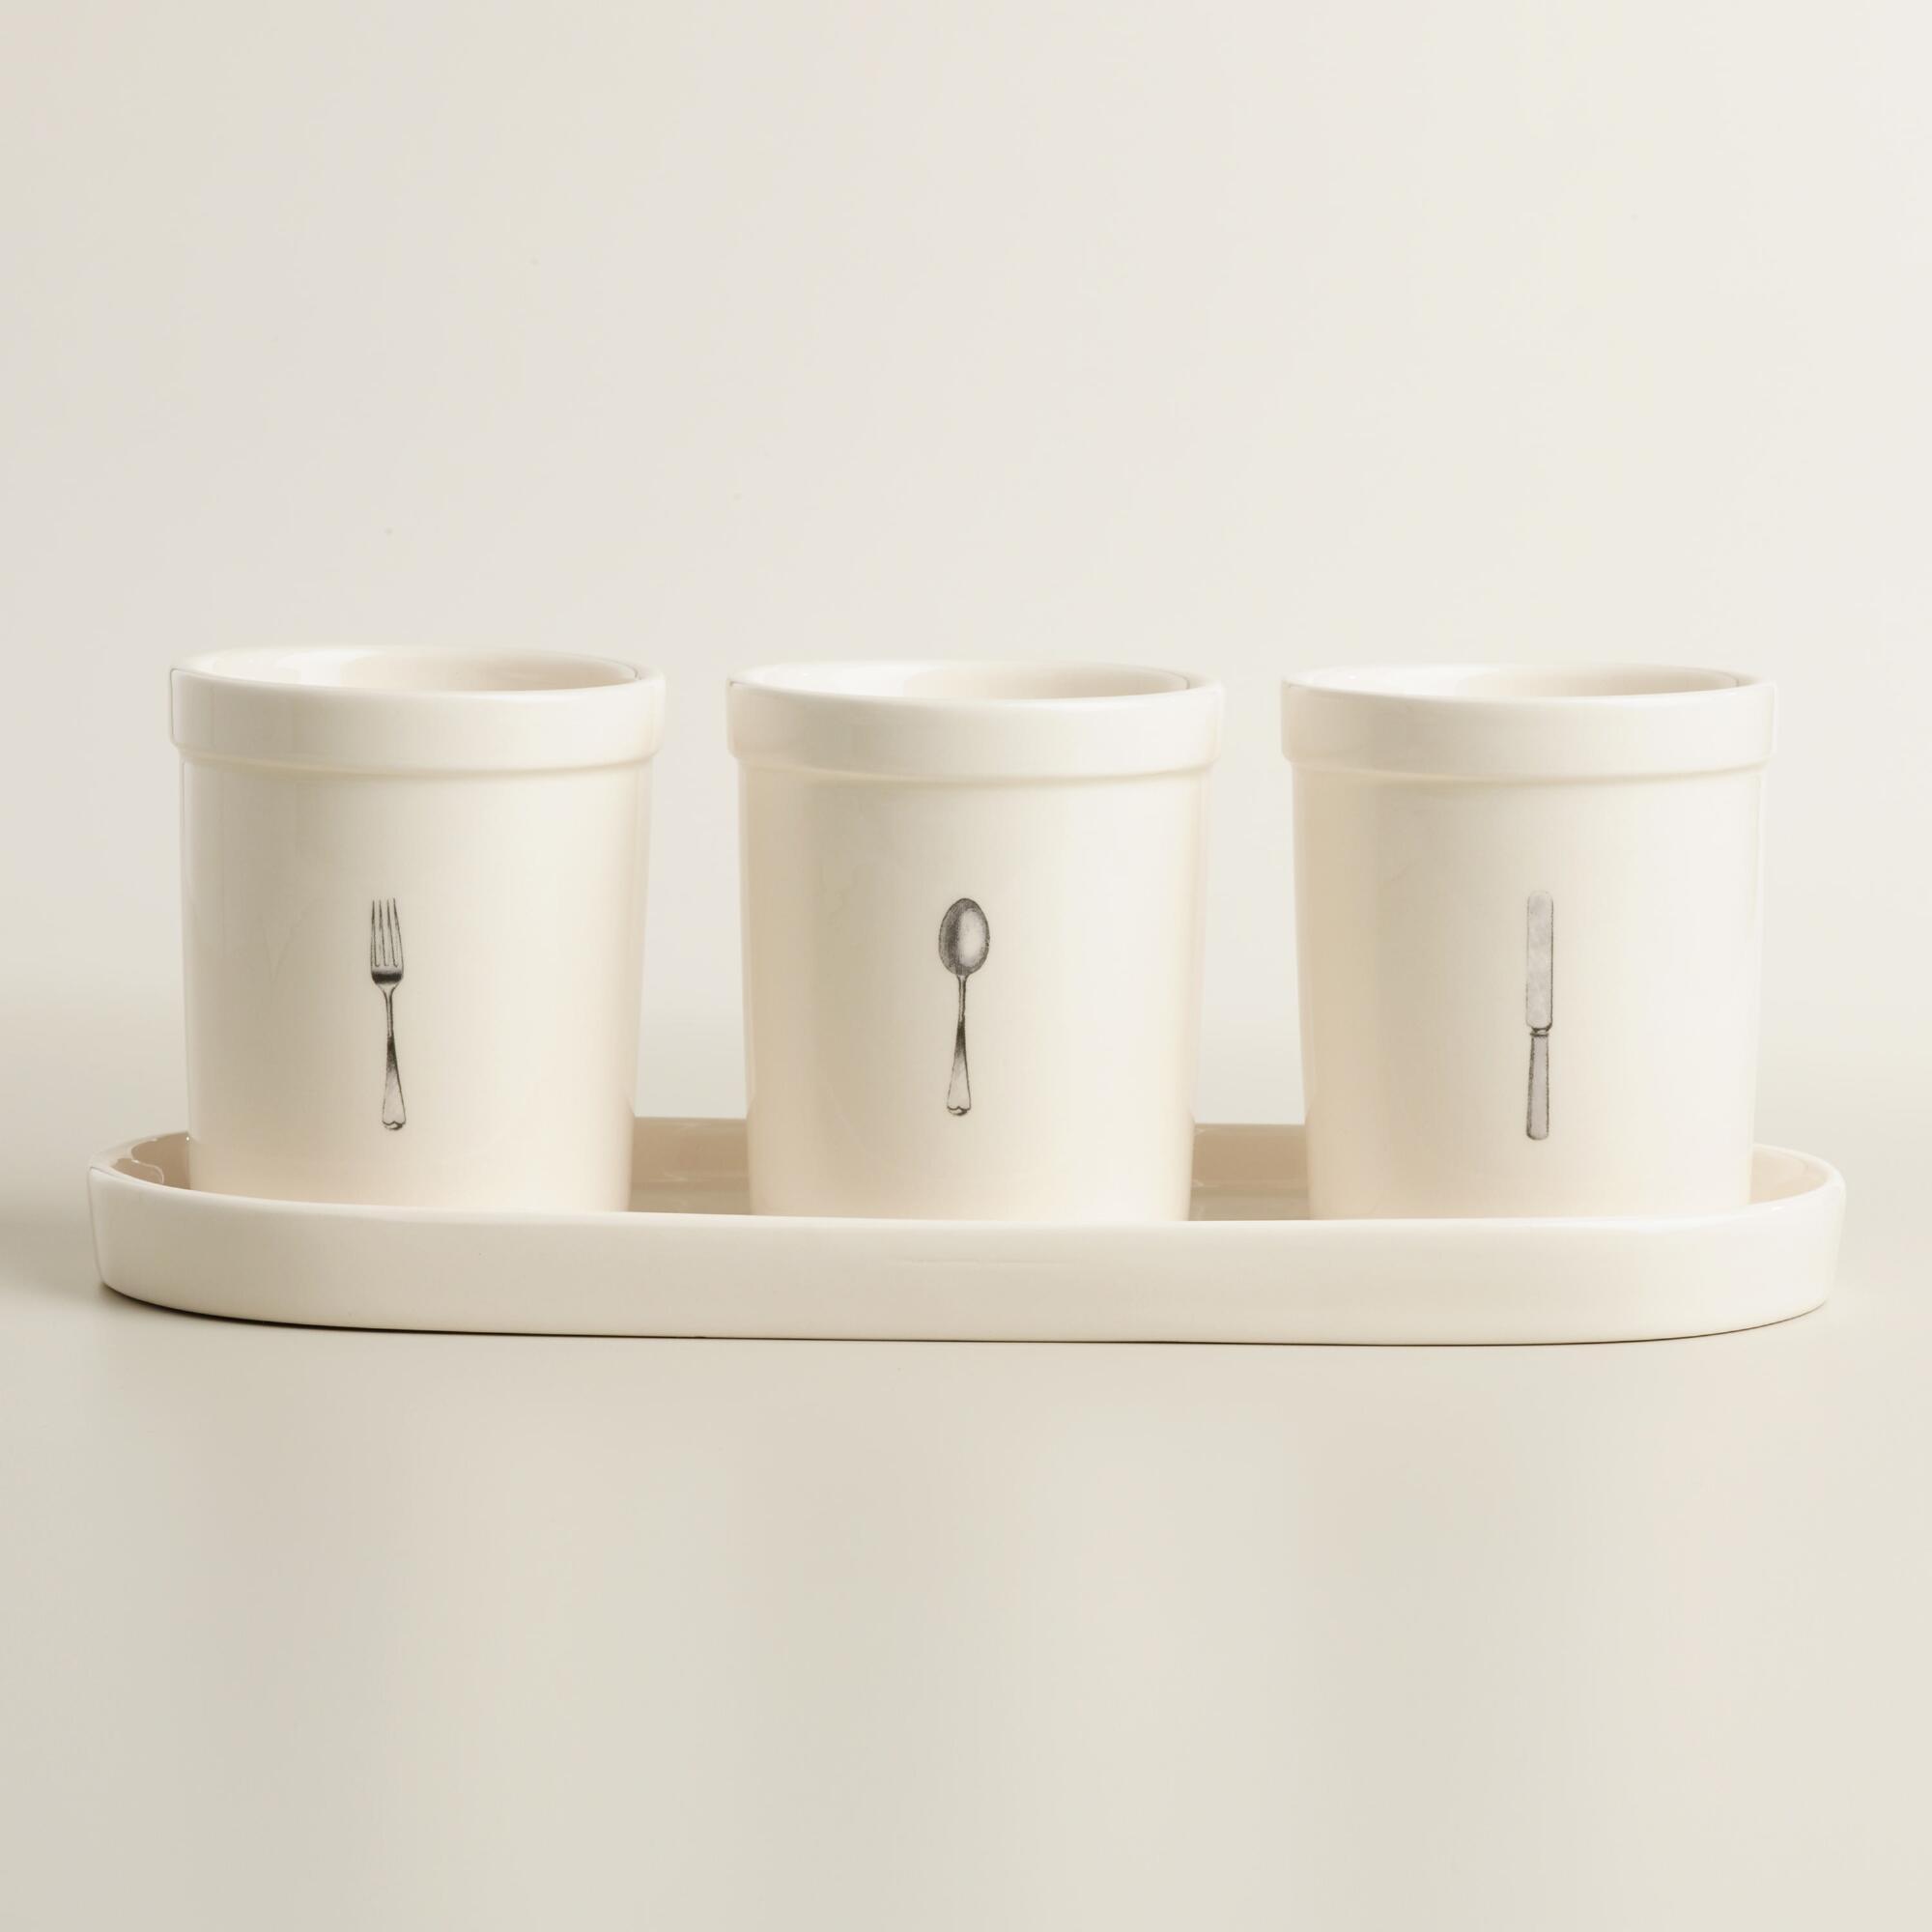 4 Piece Ceramic Flatware Caddy Set | World Market